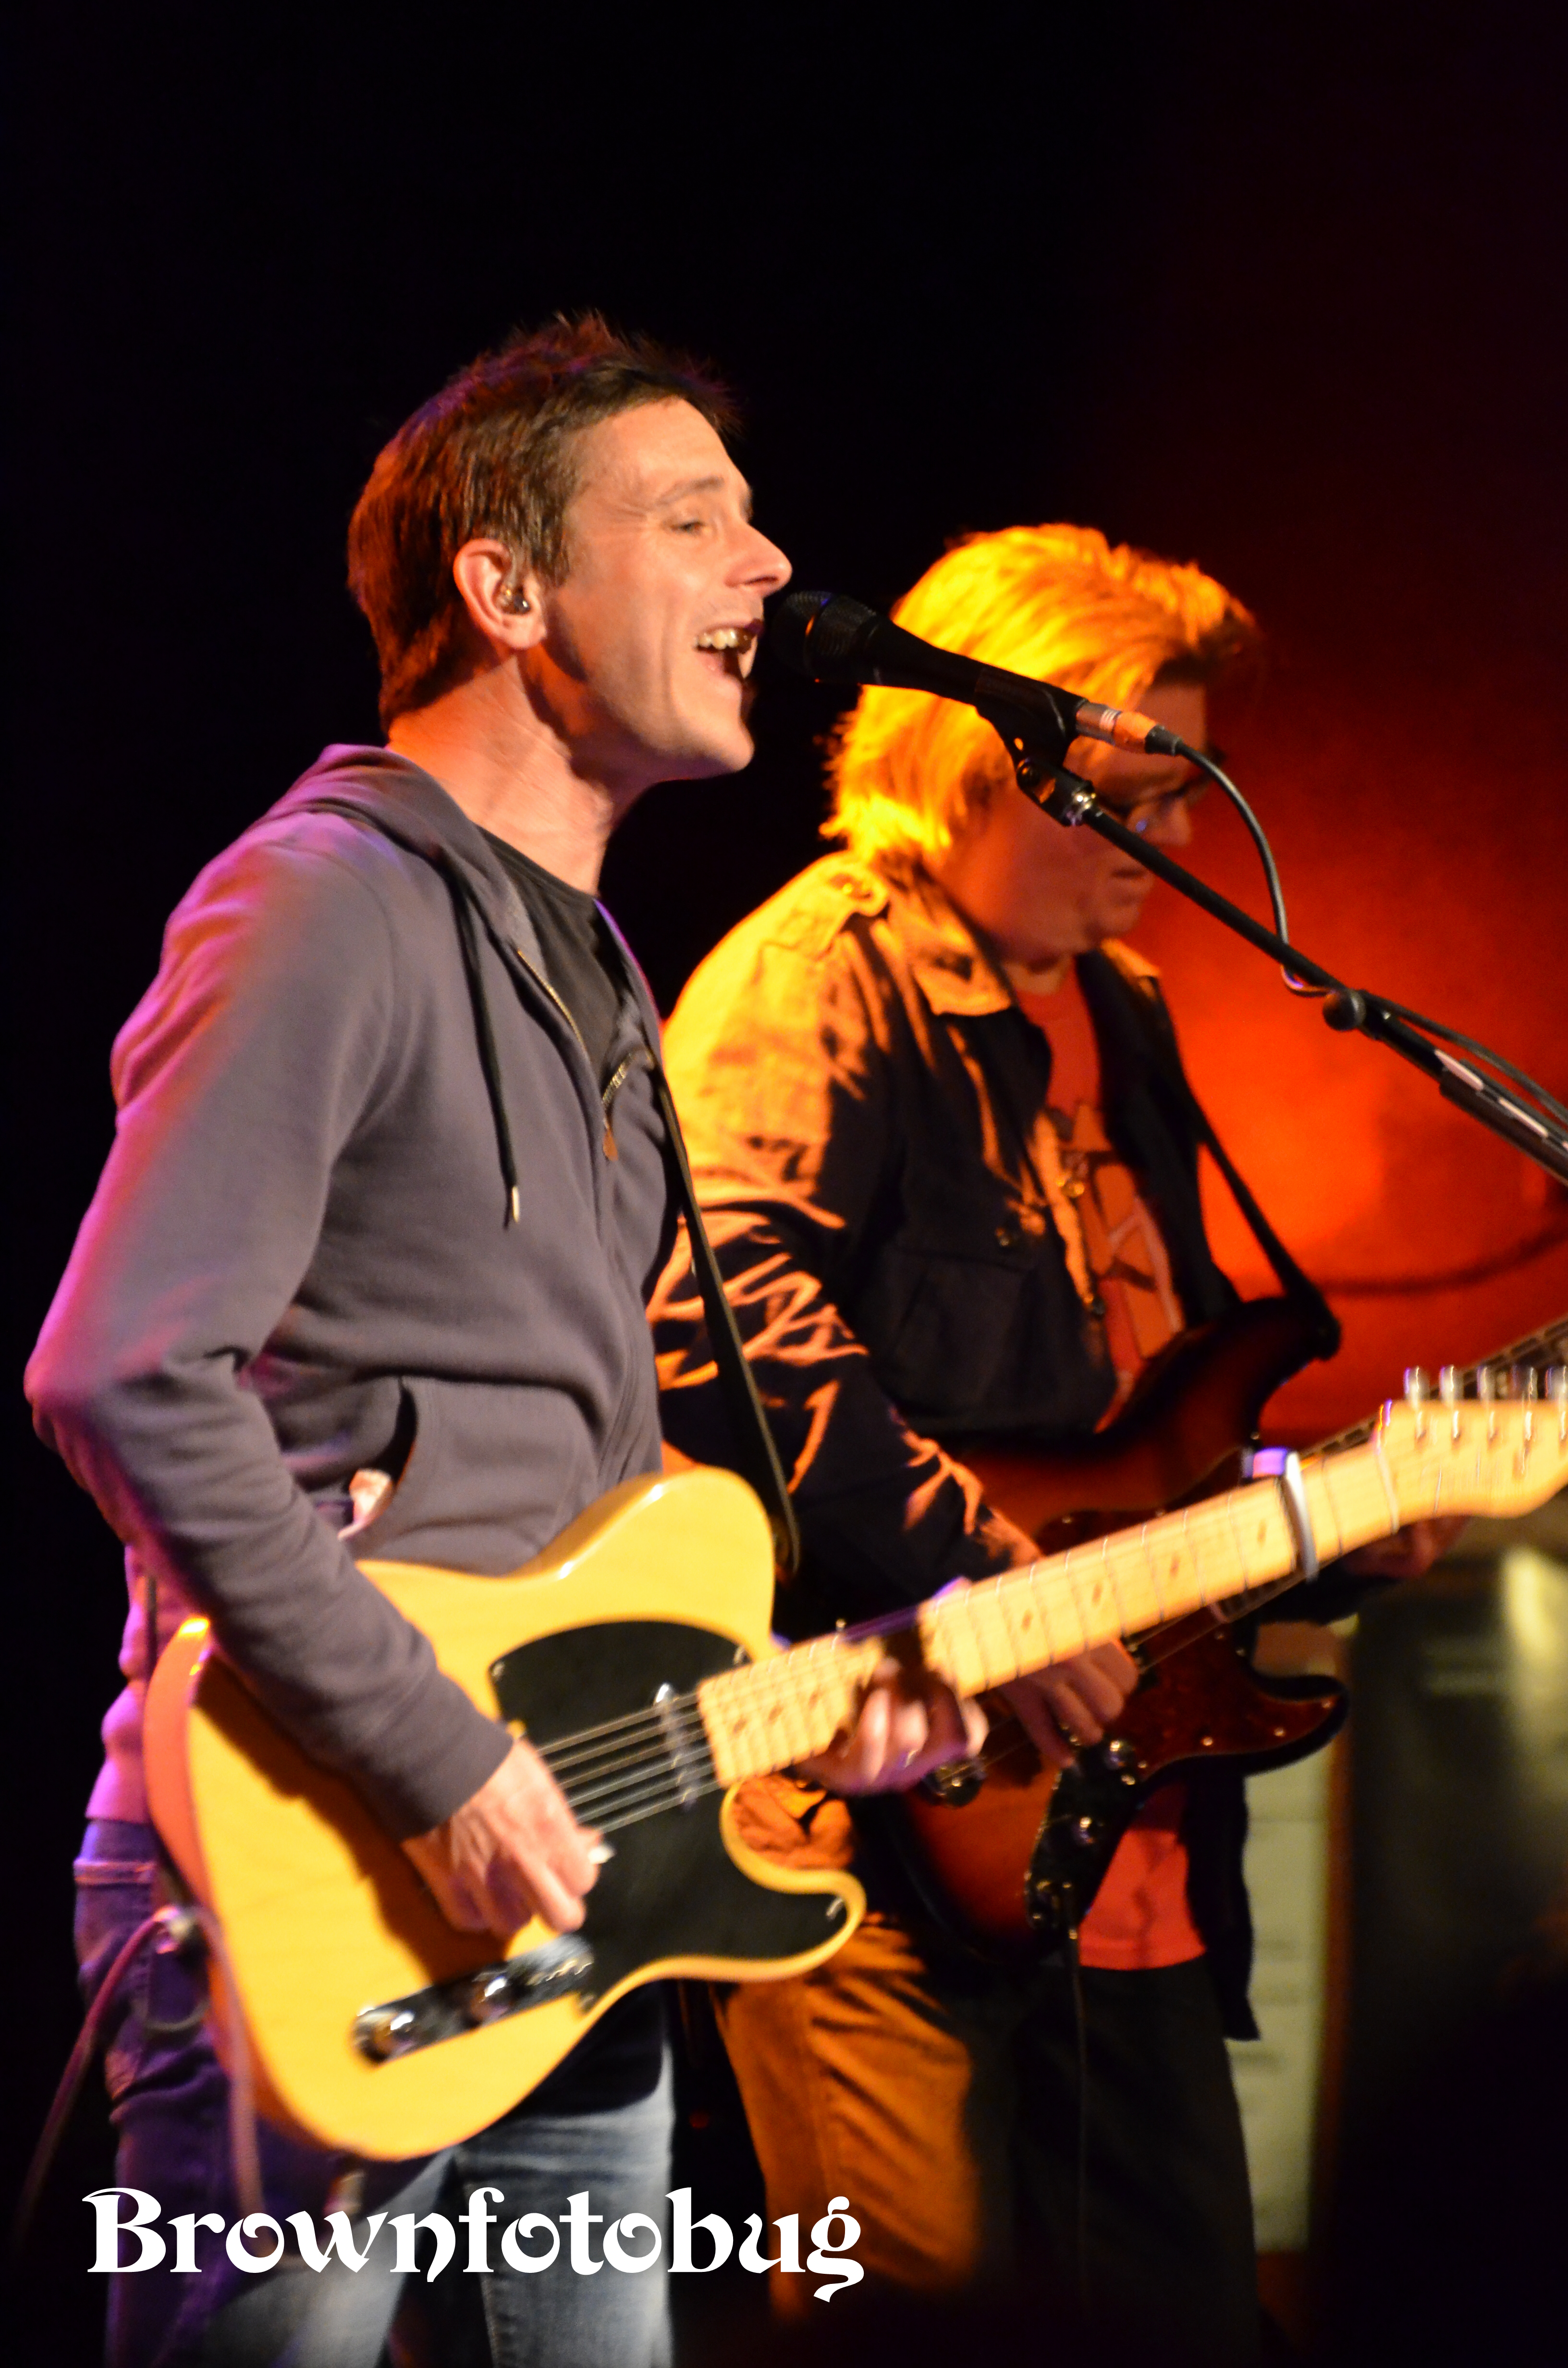 Jonathon Kingham & Toad The Wet Sprocket Live at Showbox @ The Market (Photo by Arlene Brown)